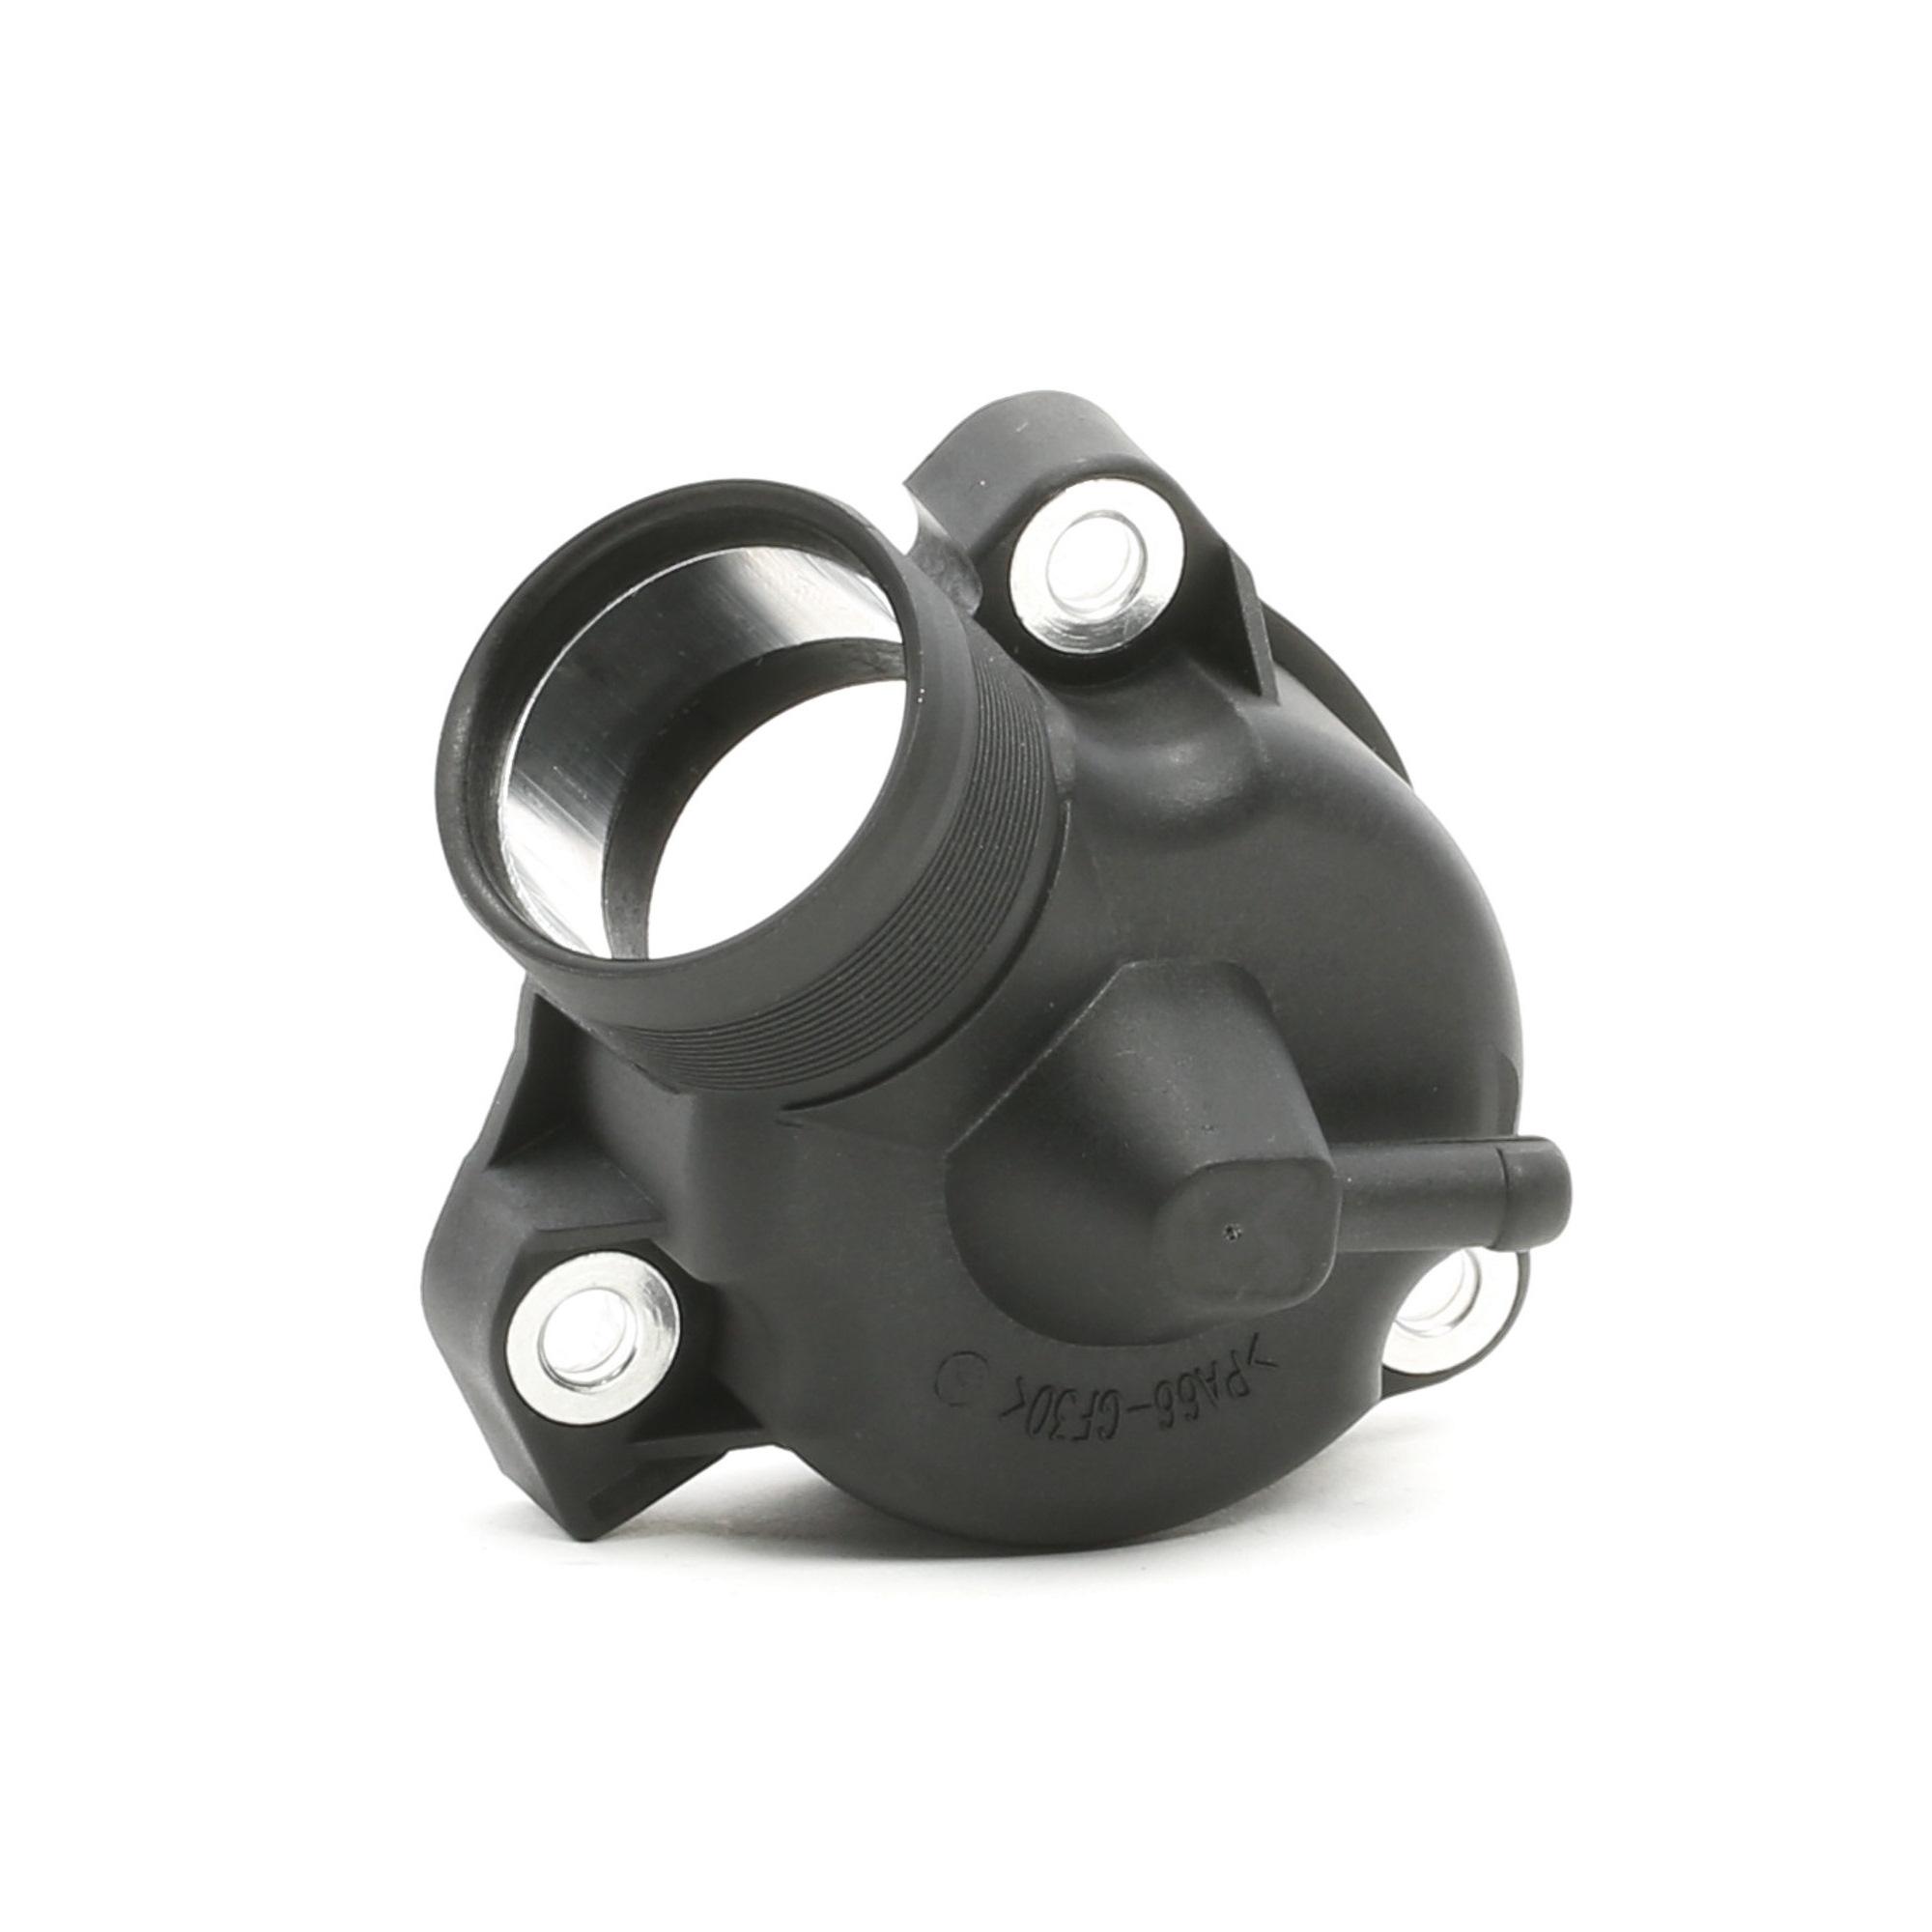 Thermostatgehäuse VEMO V30-99-0001 Bewertung